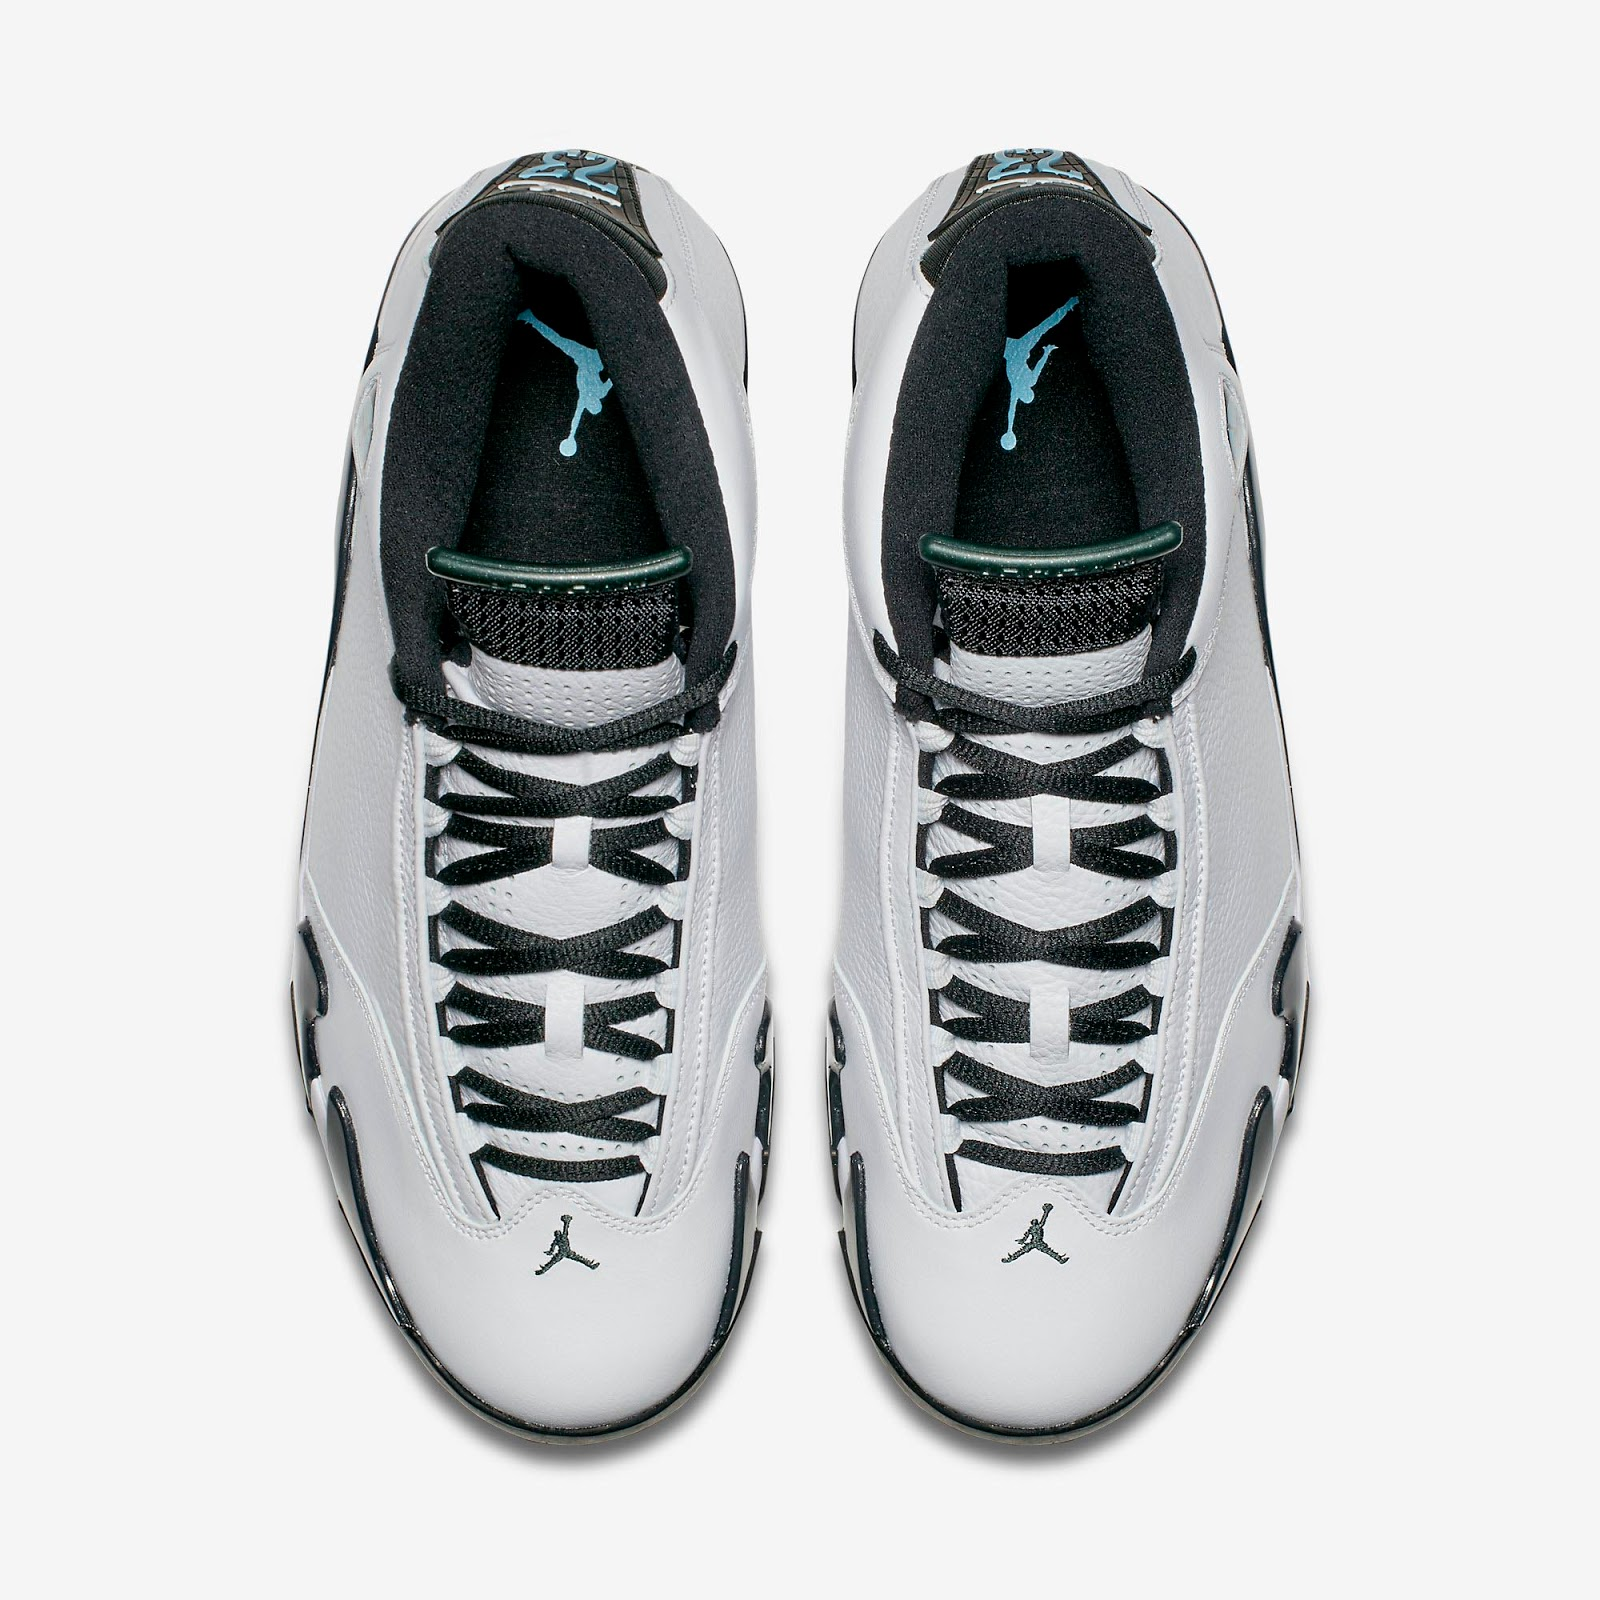 d863e583d8ab90 ajordanxi Your  1 Source For Sneaker Release Dates  Air Jordan 14 ...